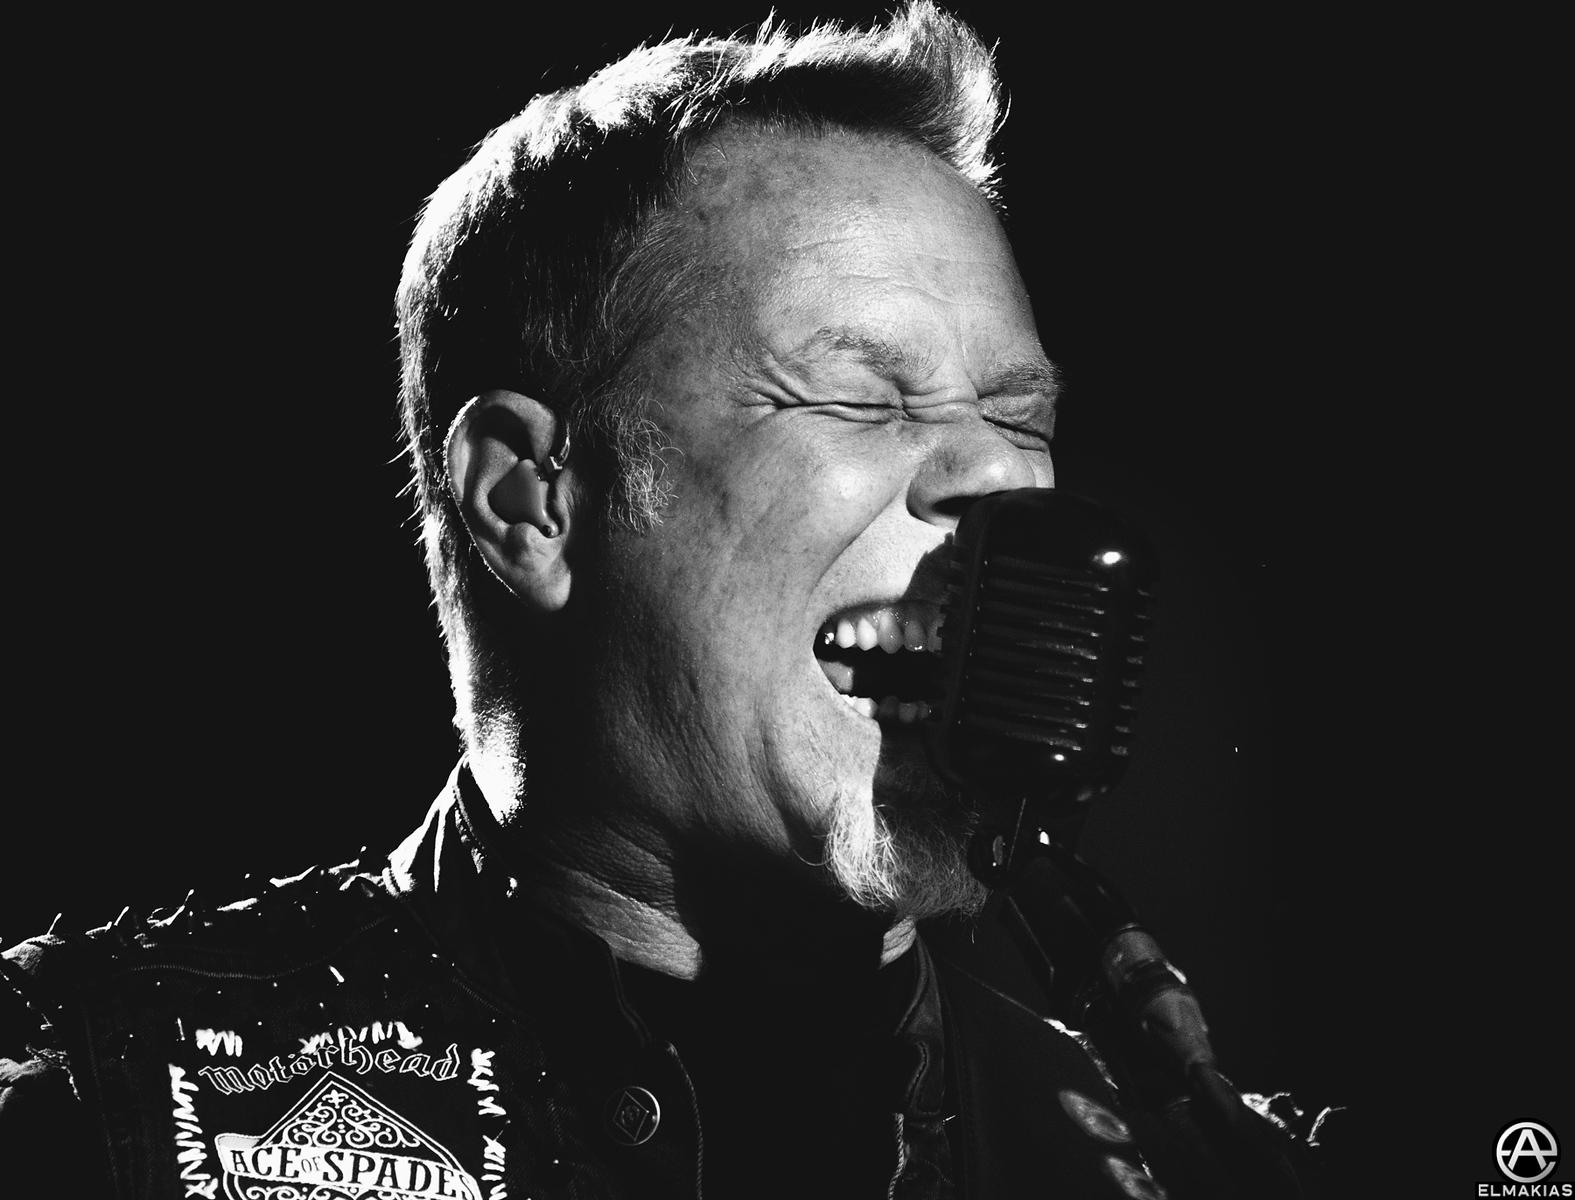 James Hetfield of Metallica at Rock in Vienna 2015 - European Festivals